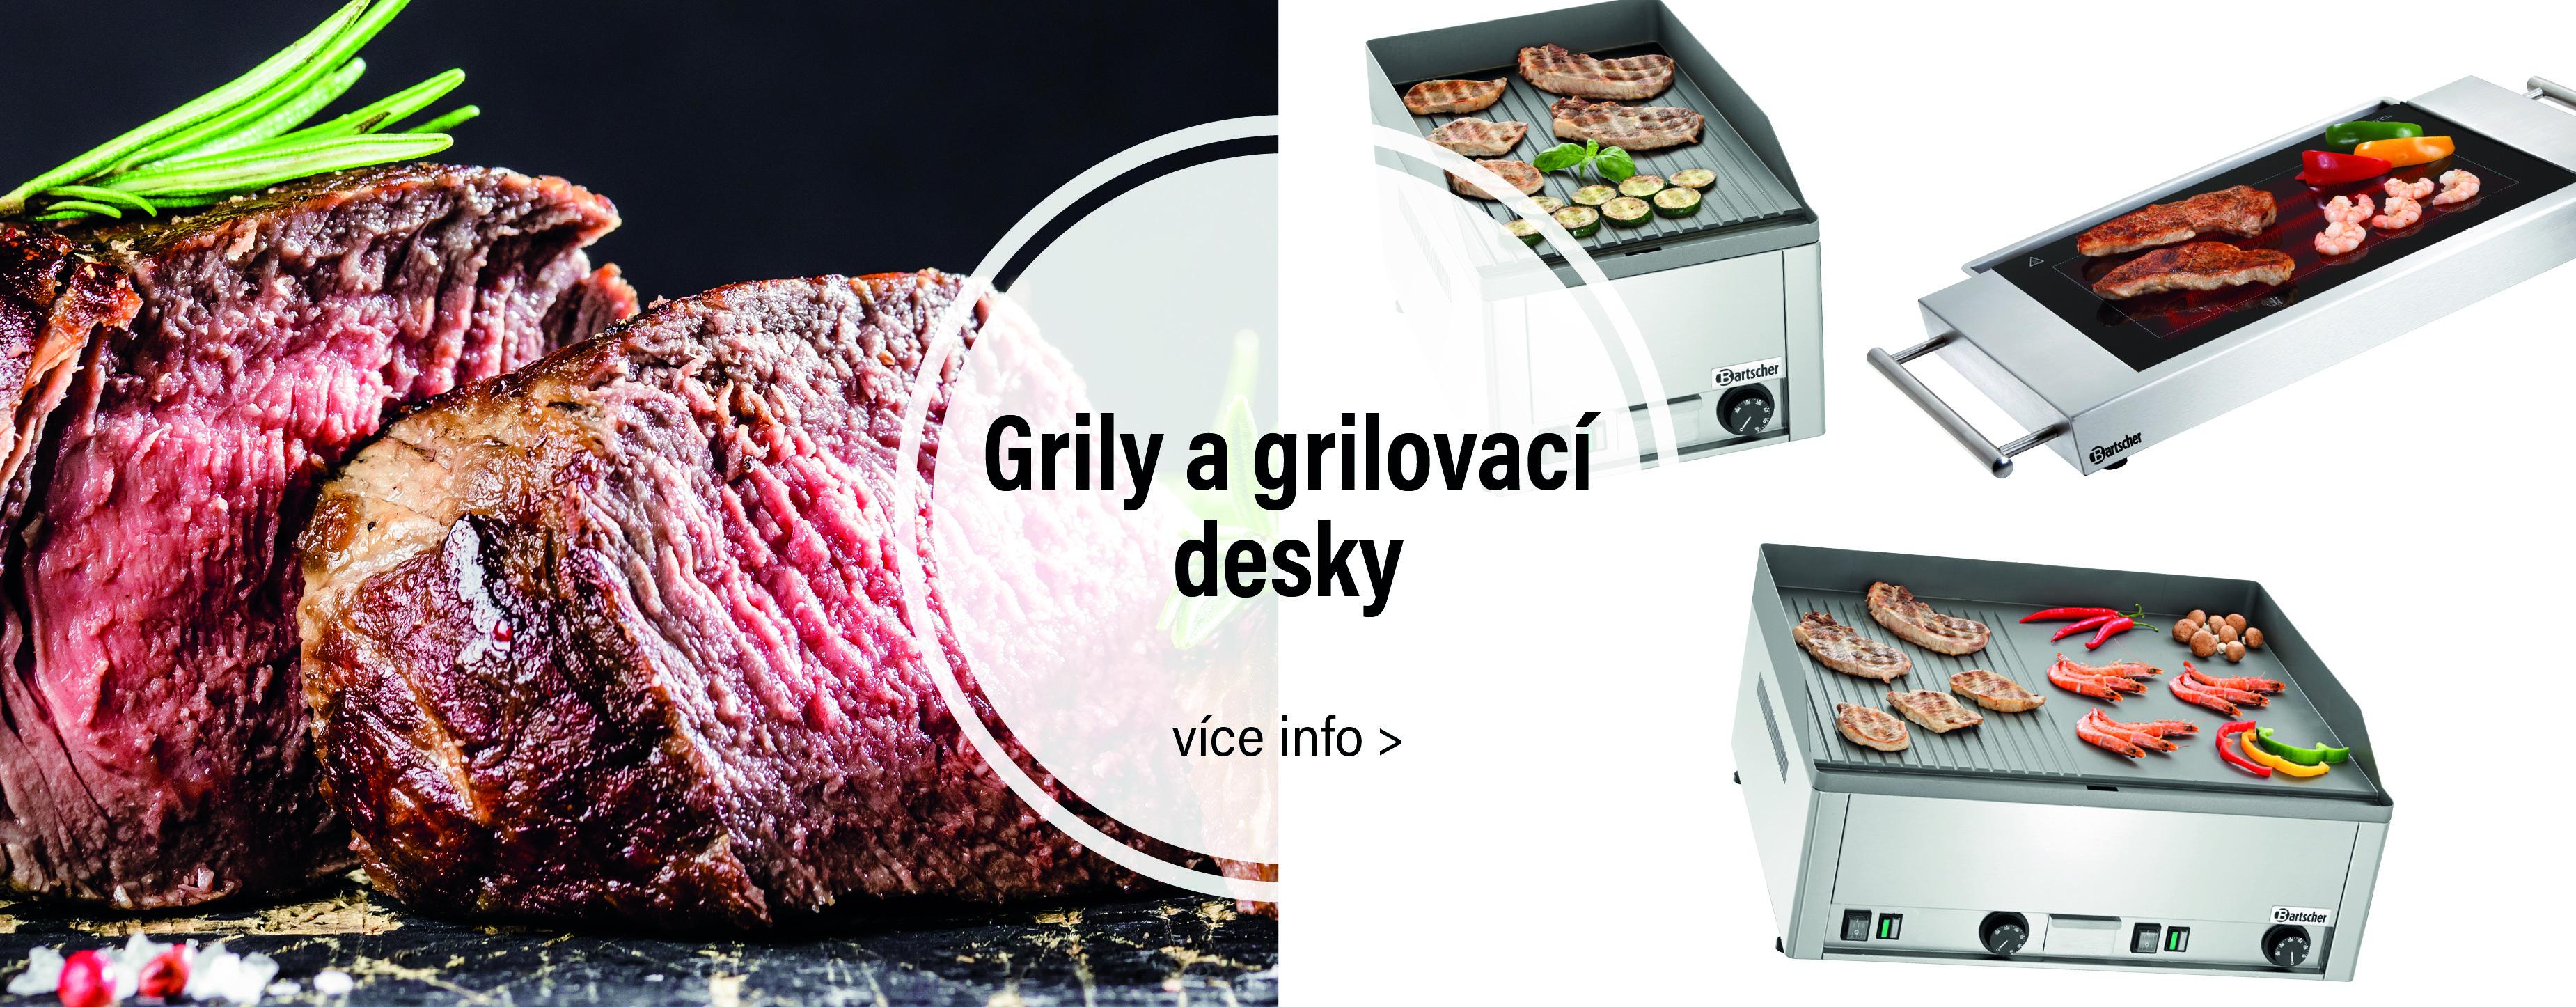 grily-a-grilovaci-desky